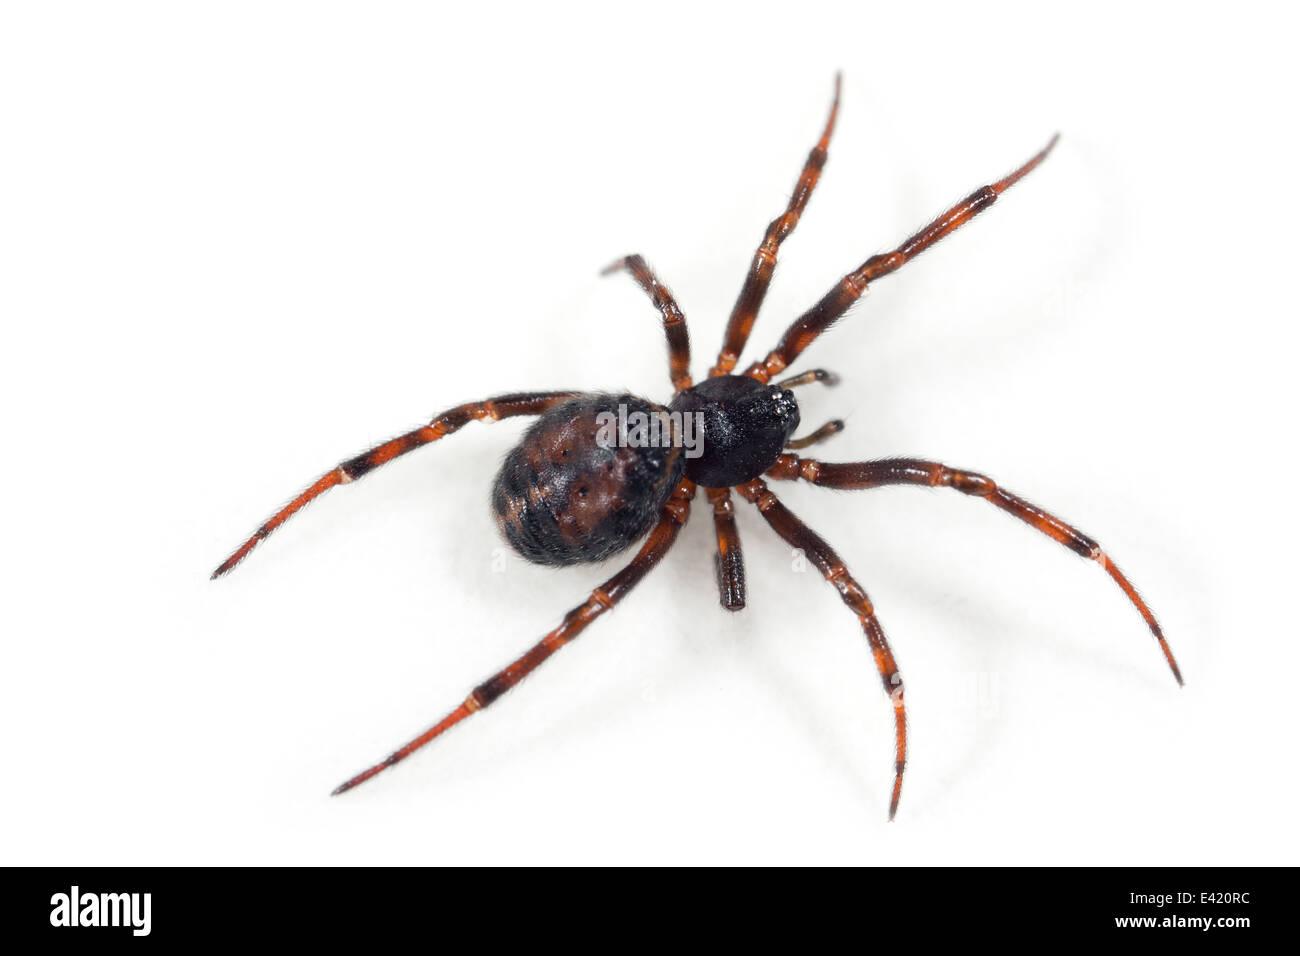 Female Steatoda bipunctata (Common false-widow) spider, part of the family Theridiidae. Isolated on white background. - Stock Image